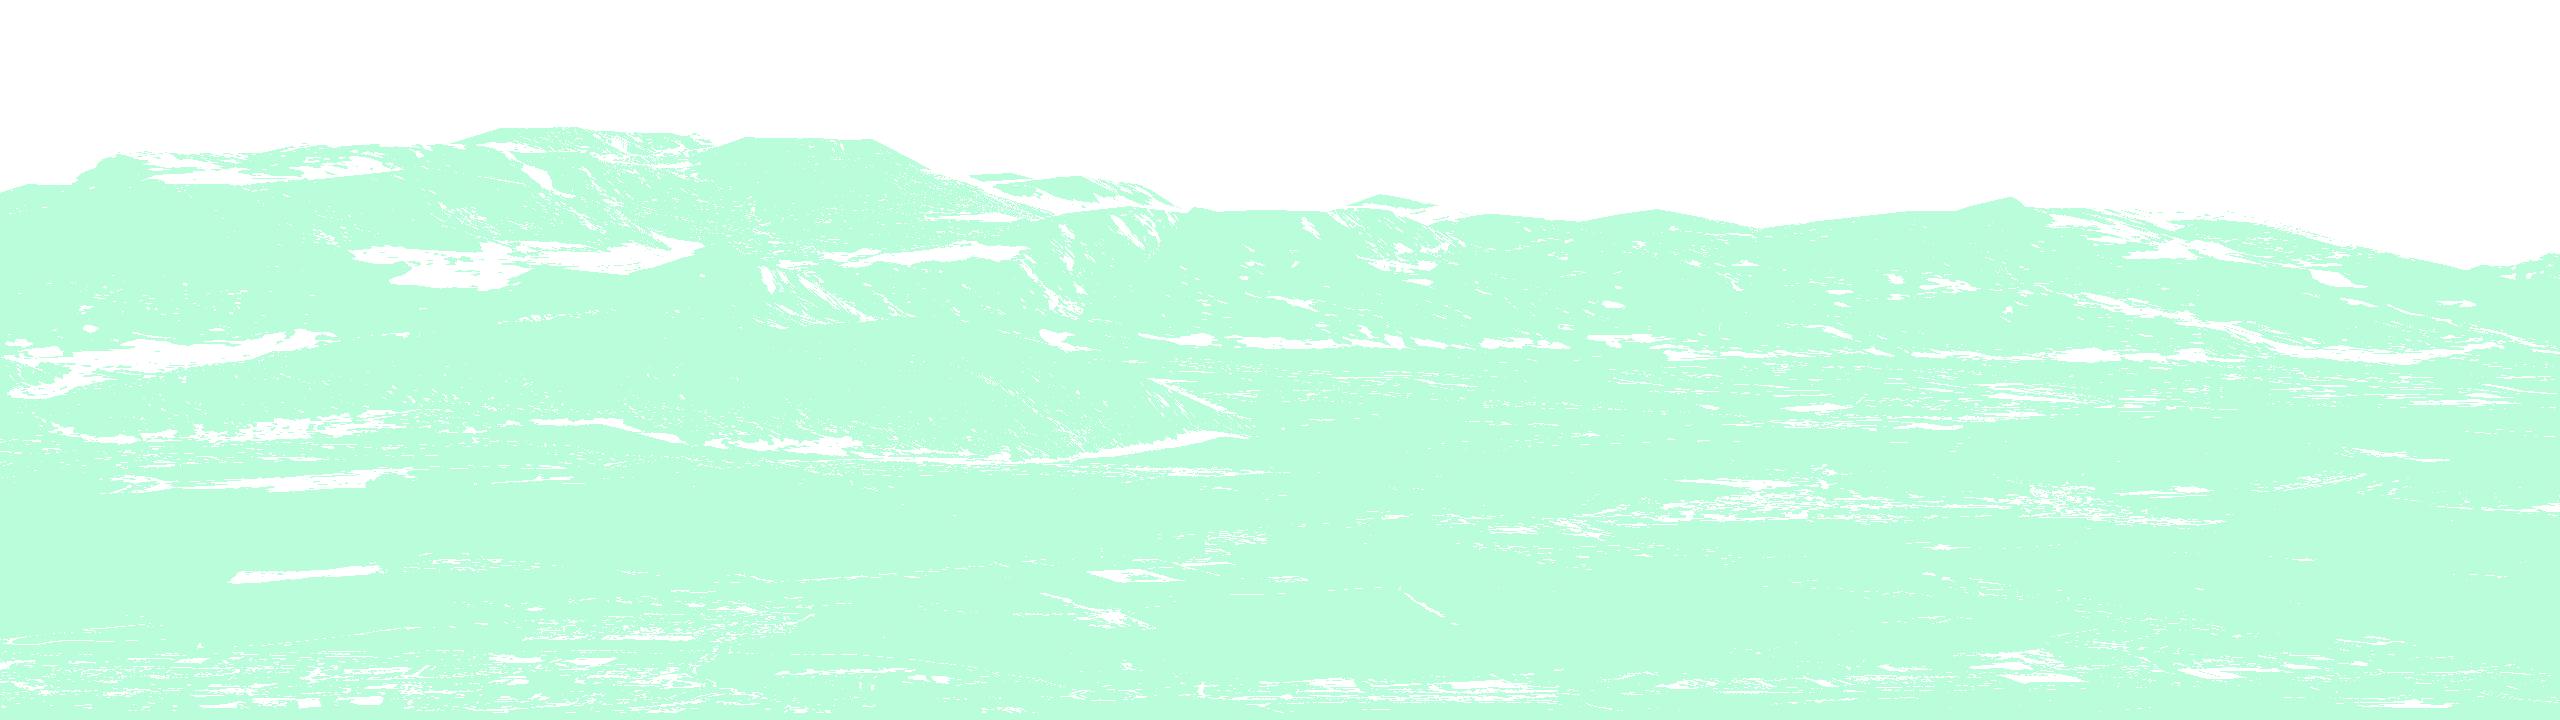 promenade_6